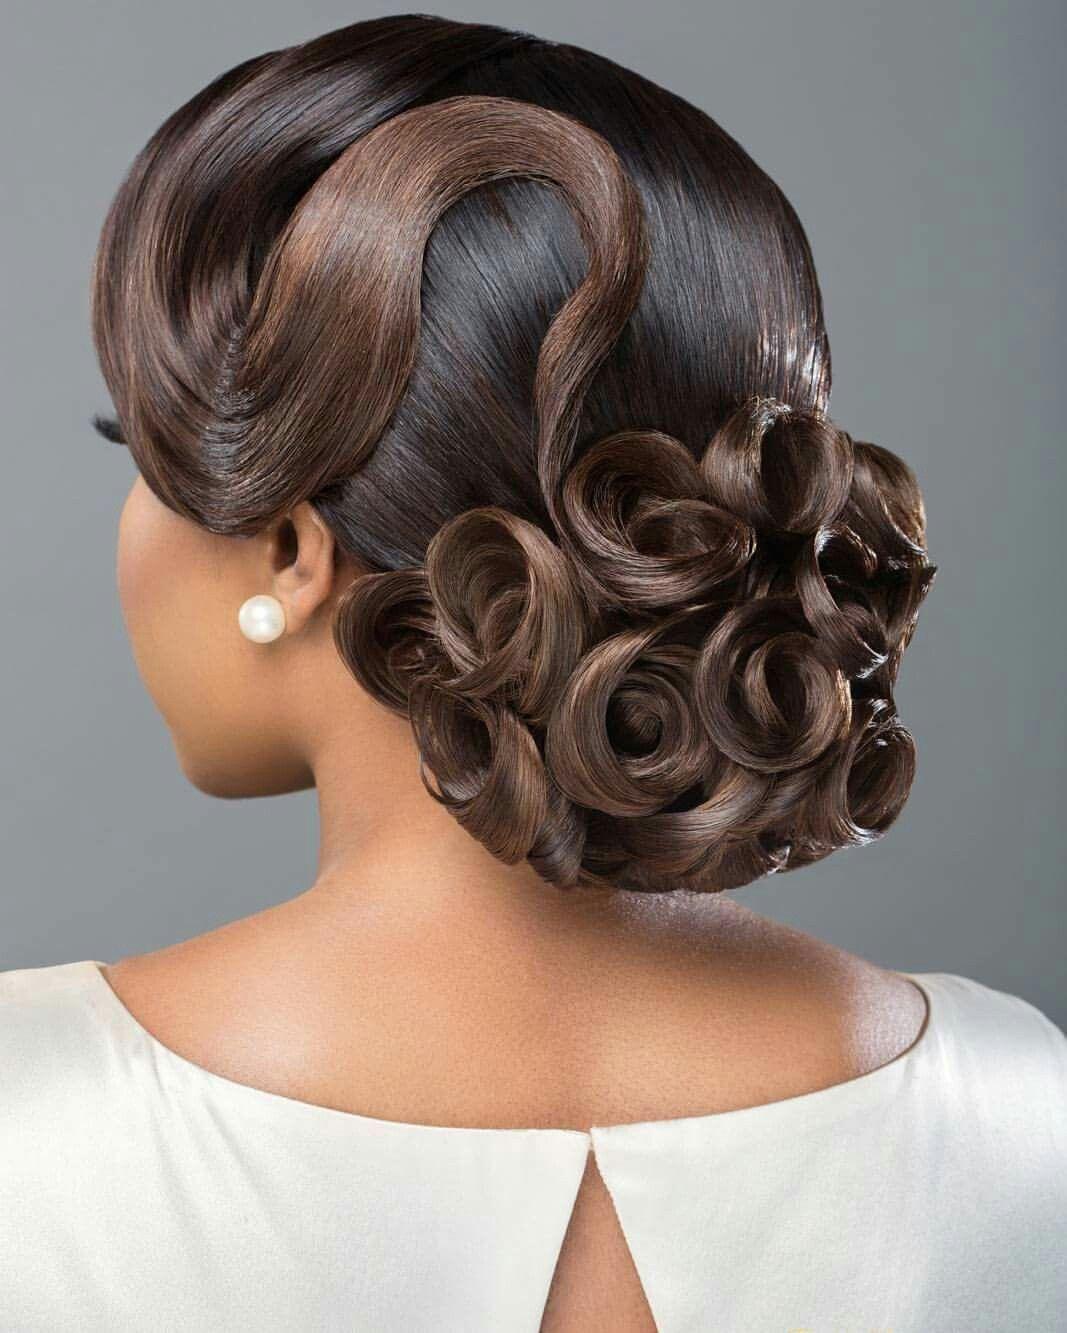 pin by sharron on wedding hair styles in 2019 | black